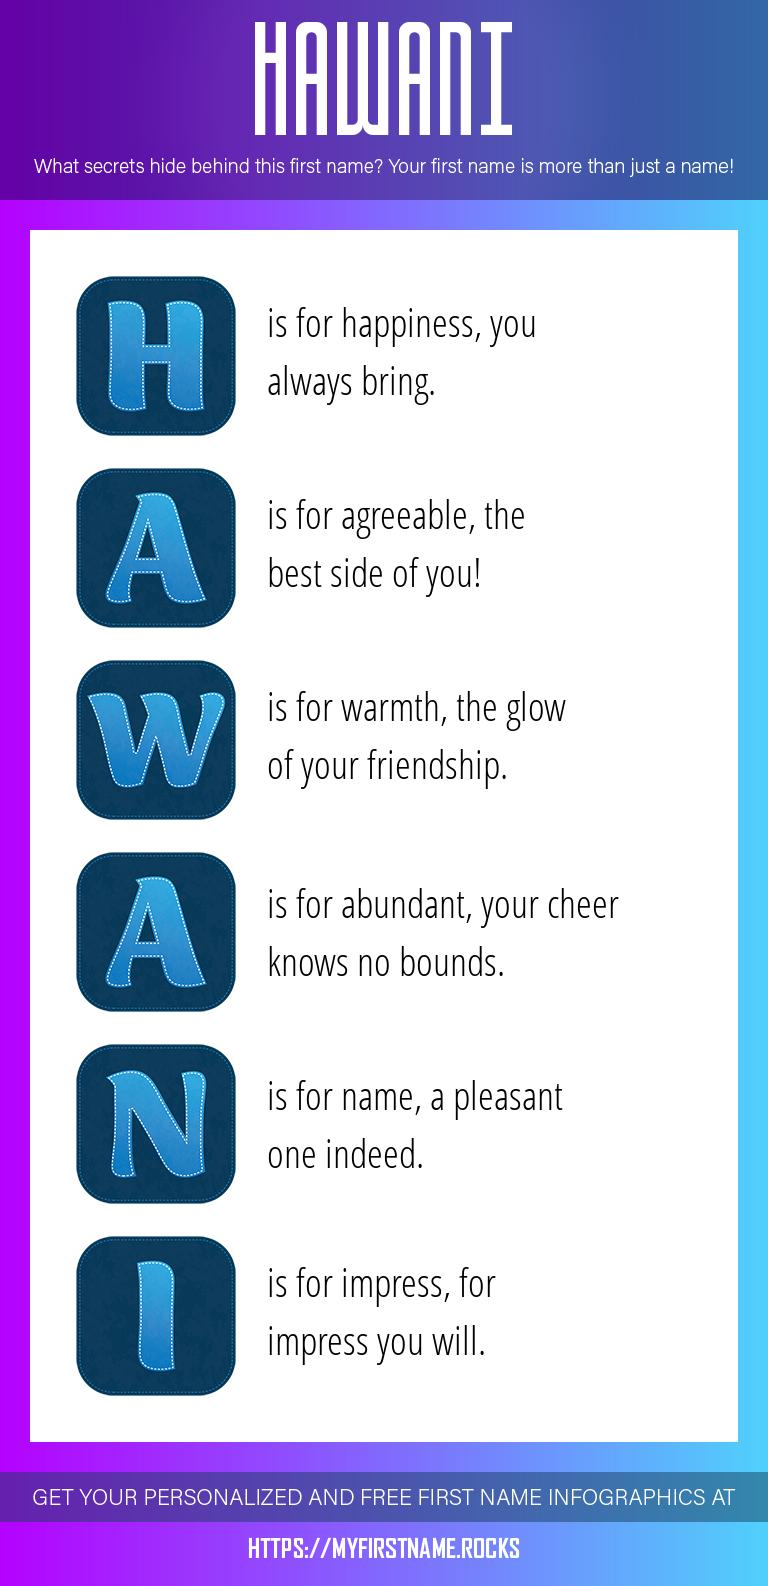 Hawani Infographics